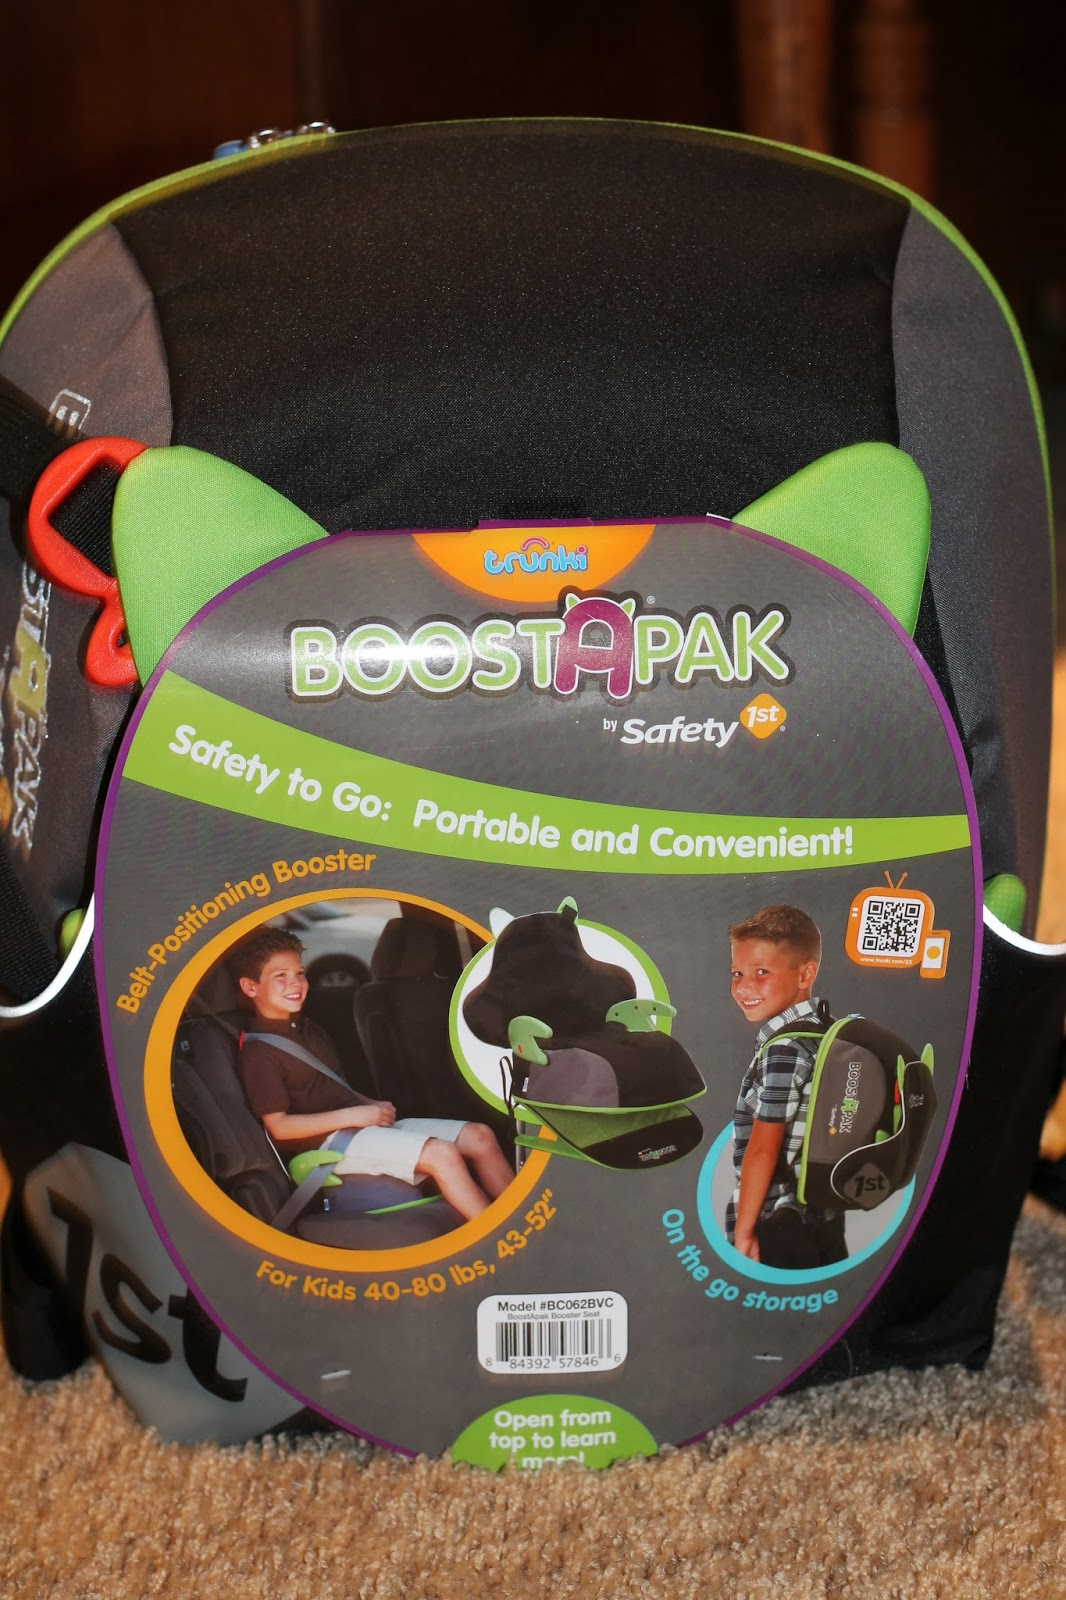 safety 1st boostapak belt positioning booster car seat review giveaway. Black Bedroom Furniture Sets. Home Design Ideas